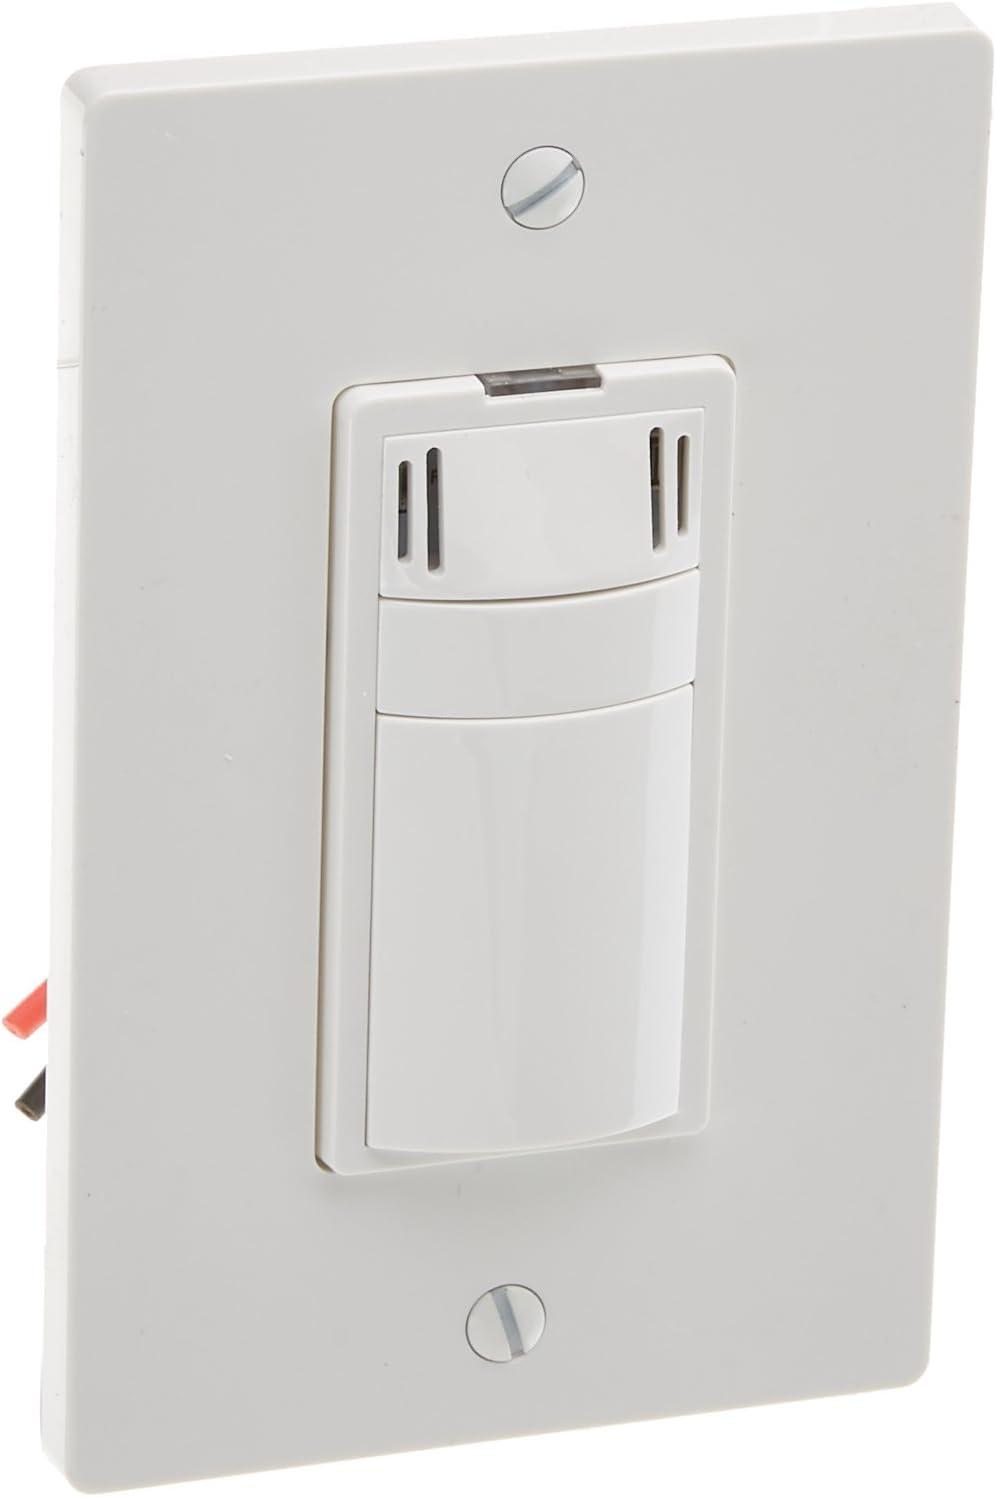 White Panasonic FV-WCSW41-W 4 Function Single Gang WhisperControl Switch